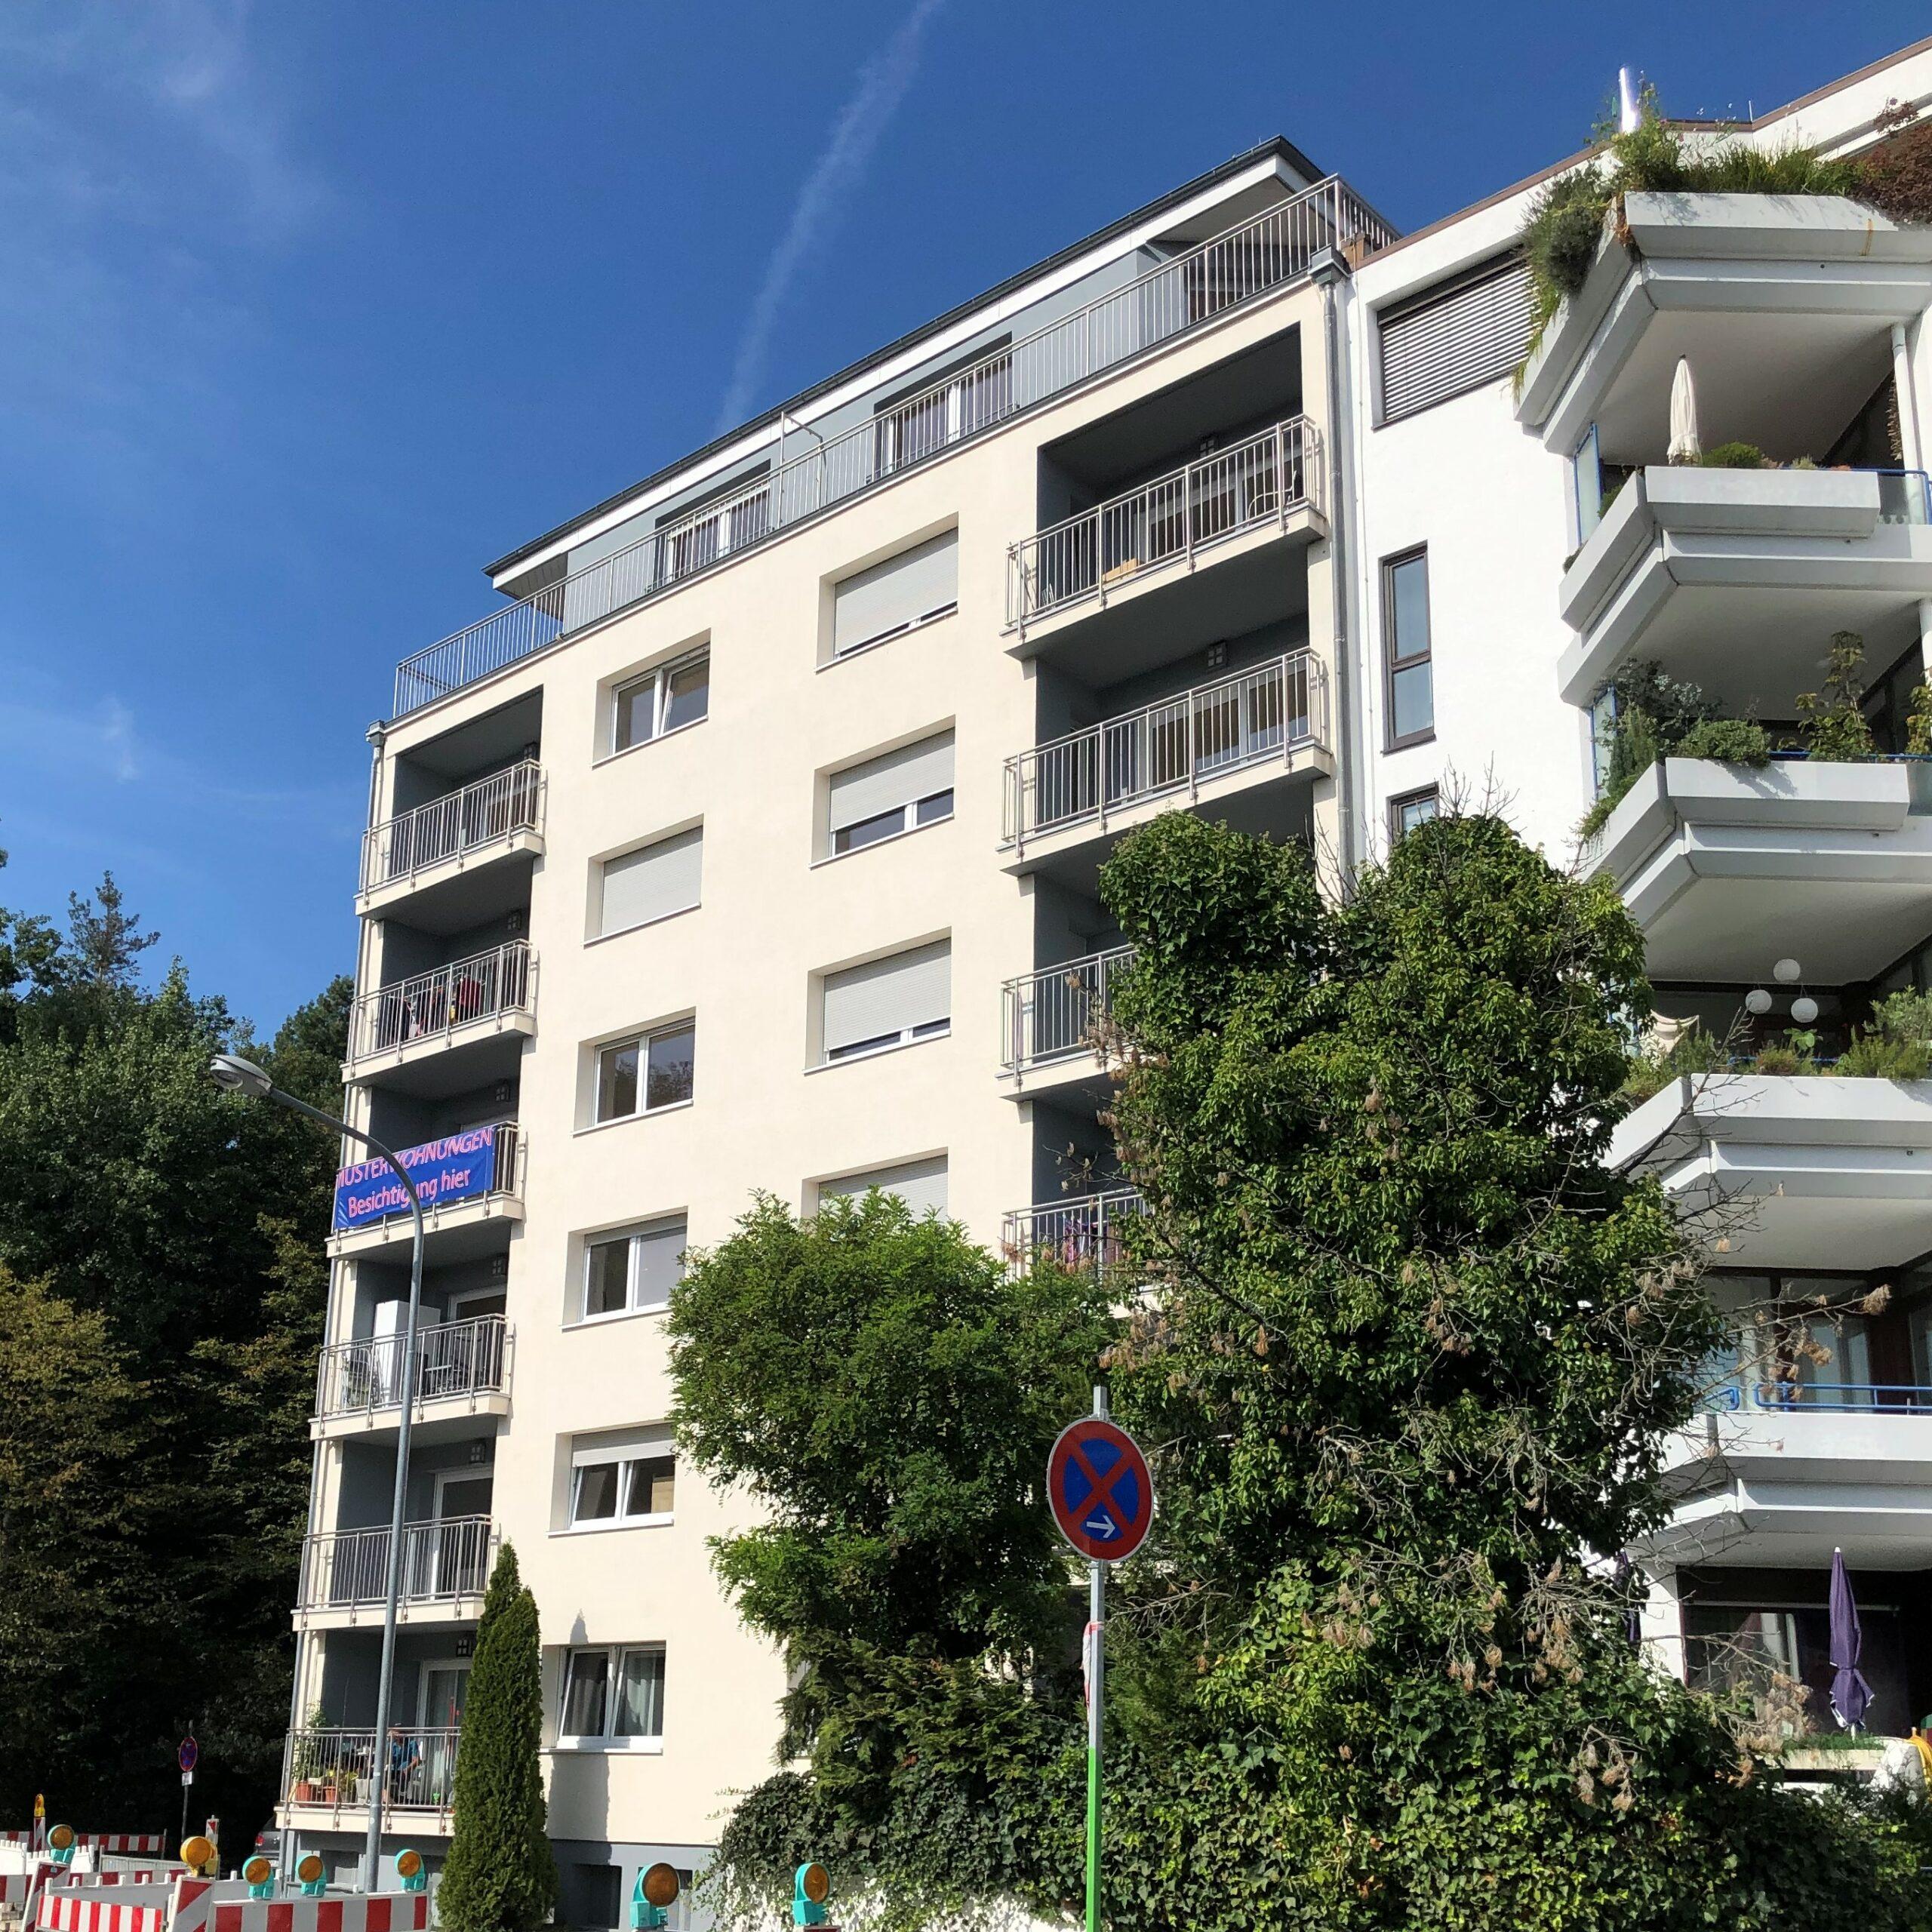 Mehrfamilienhaus Frankfurt Obertshause